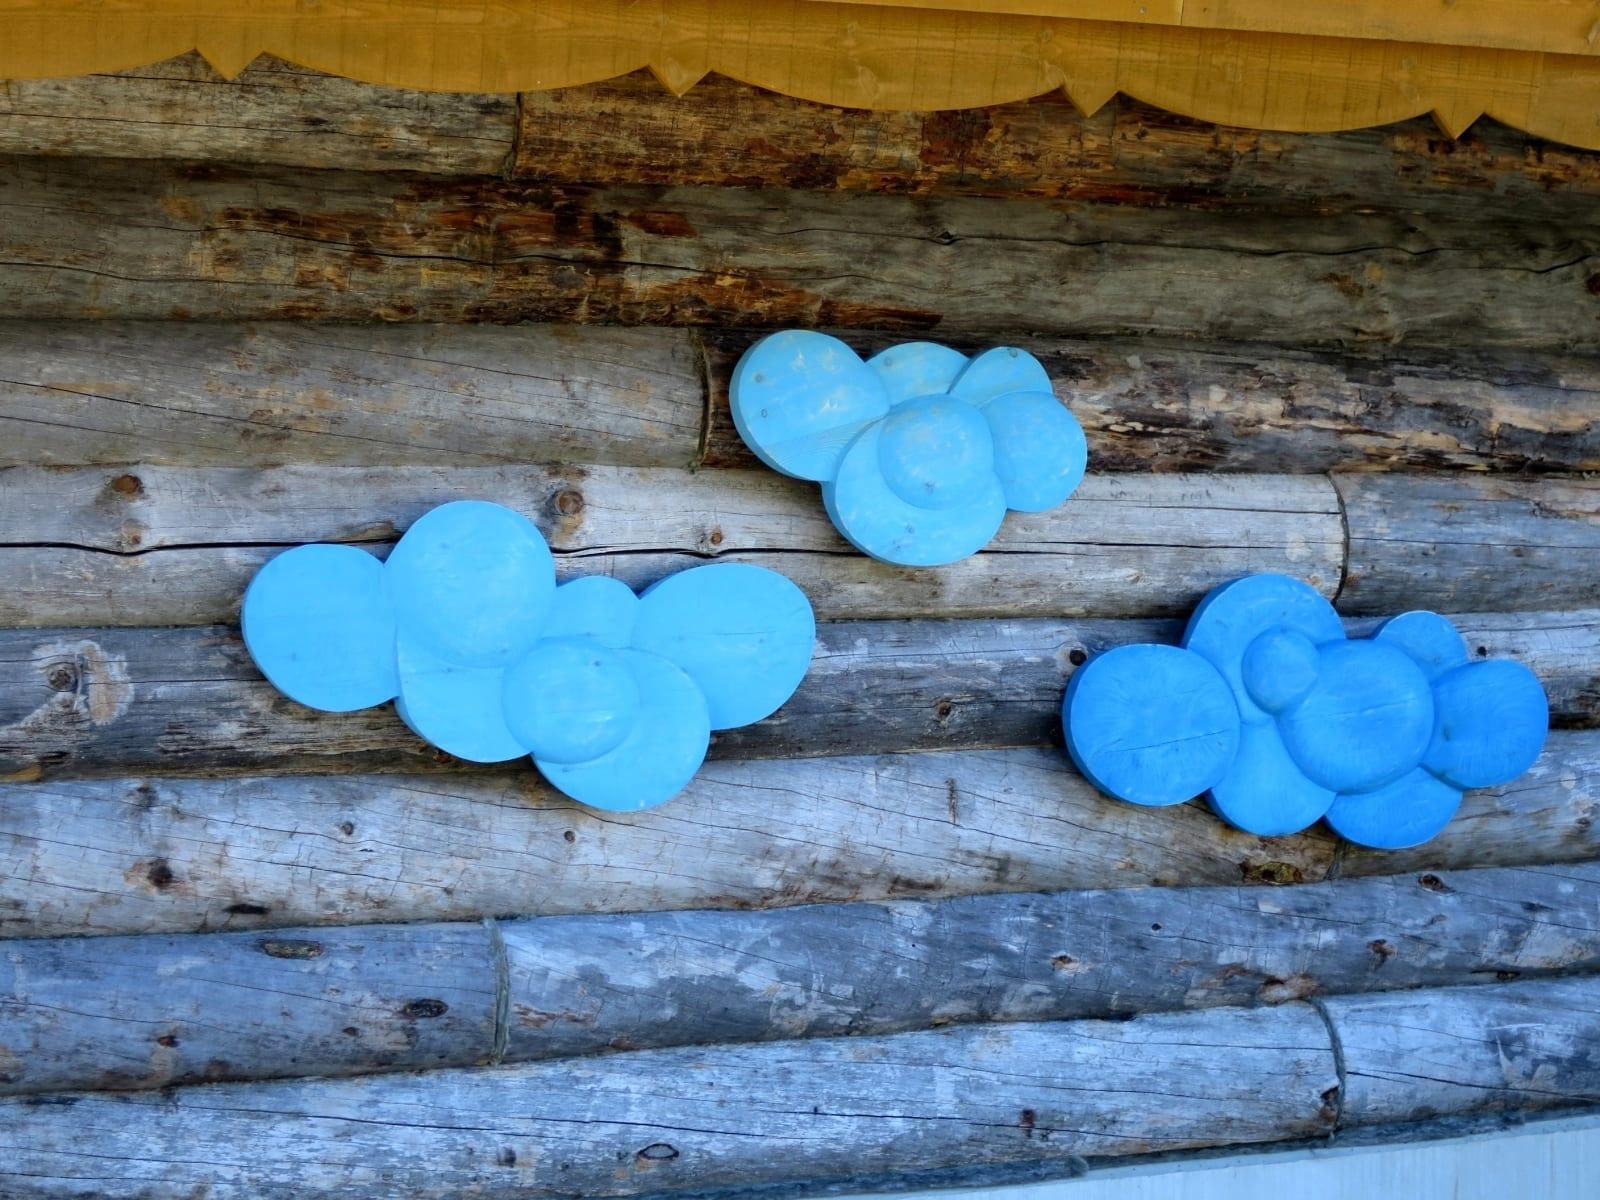 """RIPUTATUD TAEVAS"" 2016 puu  - maakunsti sümpoosion ""Arctic Week"" Kakslauttanen, Lapimaa, Soome <br/> ""HANGED SKY"" 2016 wood - symposium Arctic Week,  Kakslauttanen, Lapland, Finland"